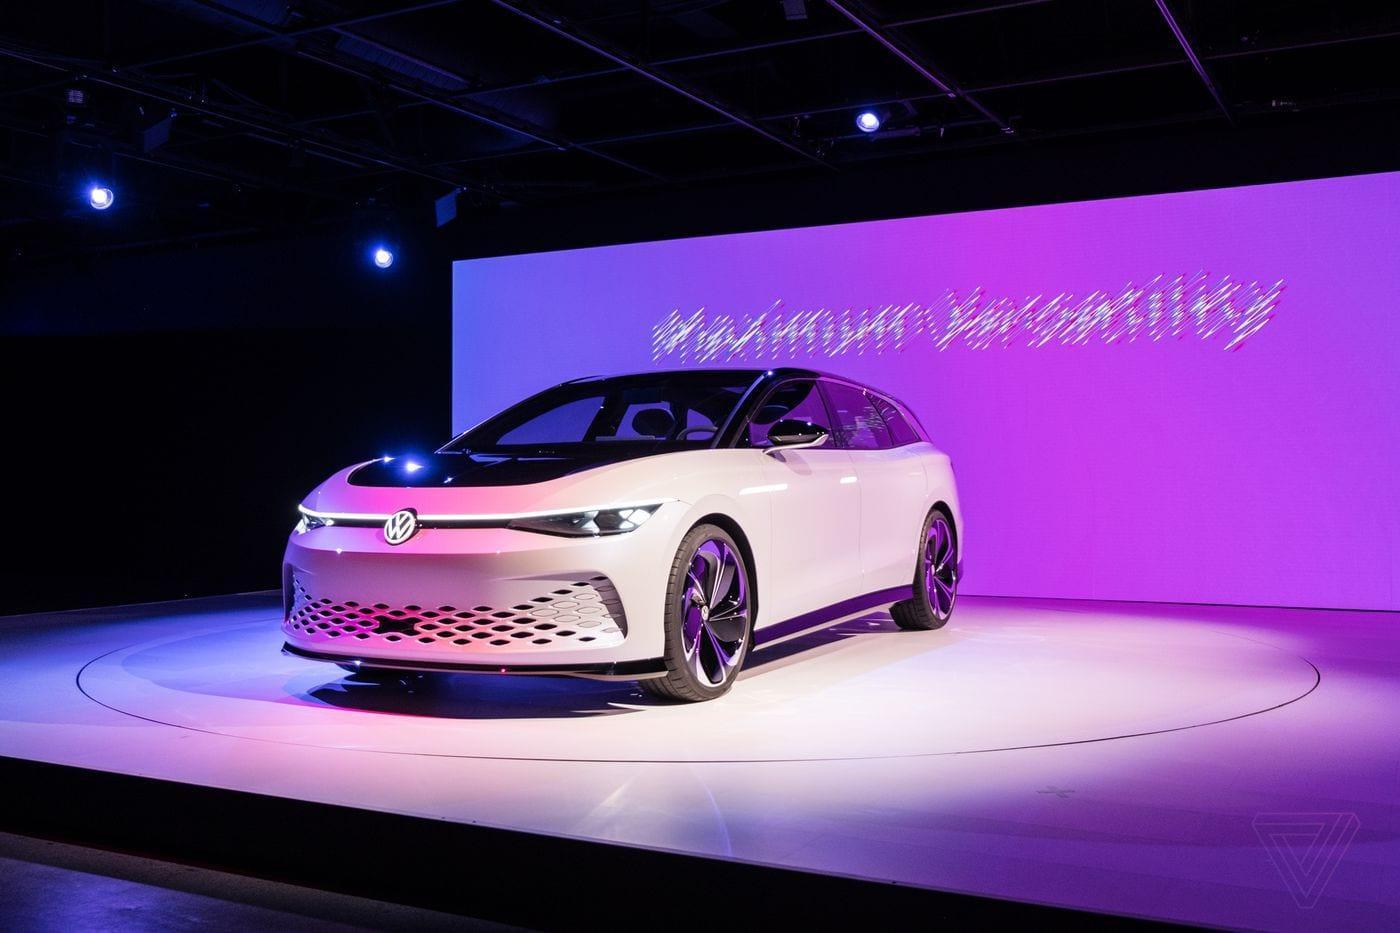 Volkswagen представил электромобиль Volkswagen ID Space Vizzion (sokane 191119 3802 6921 large)